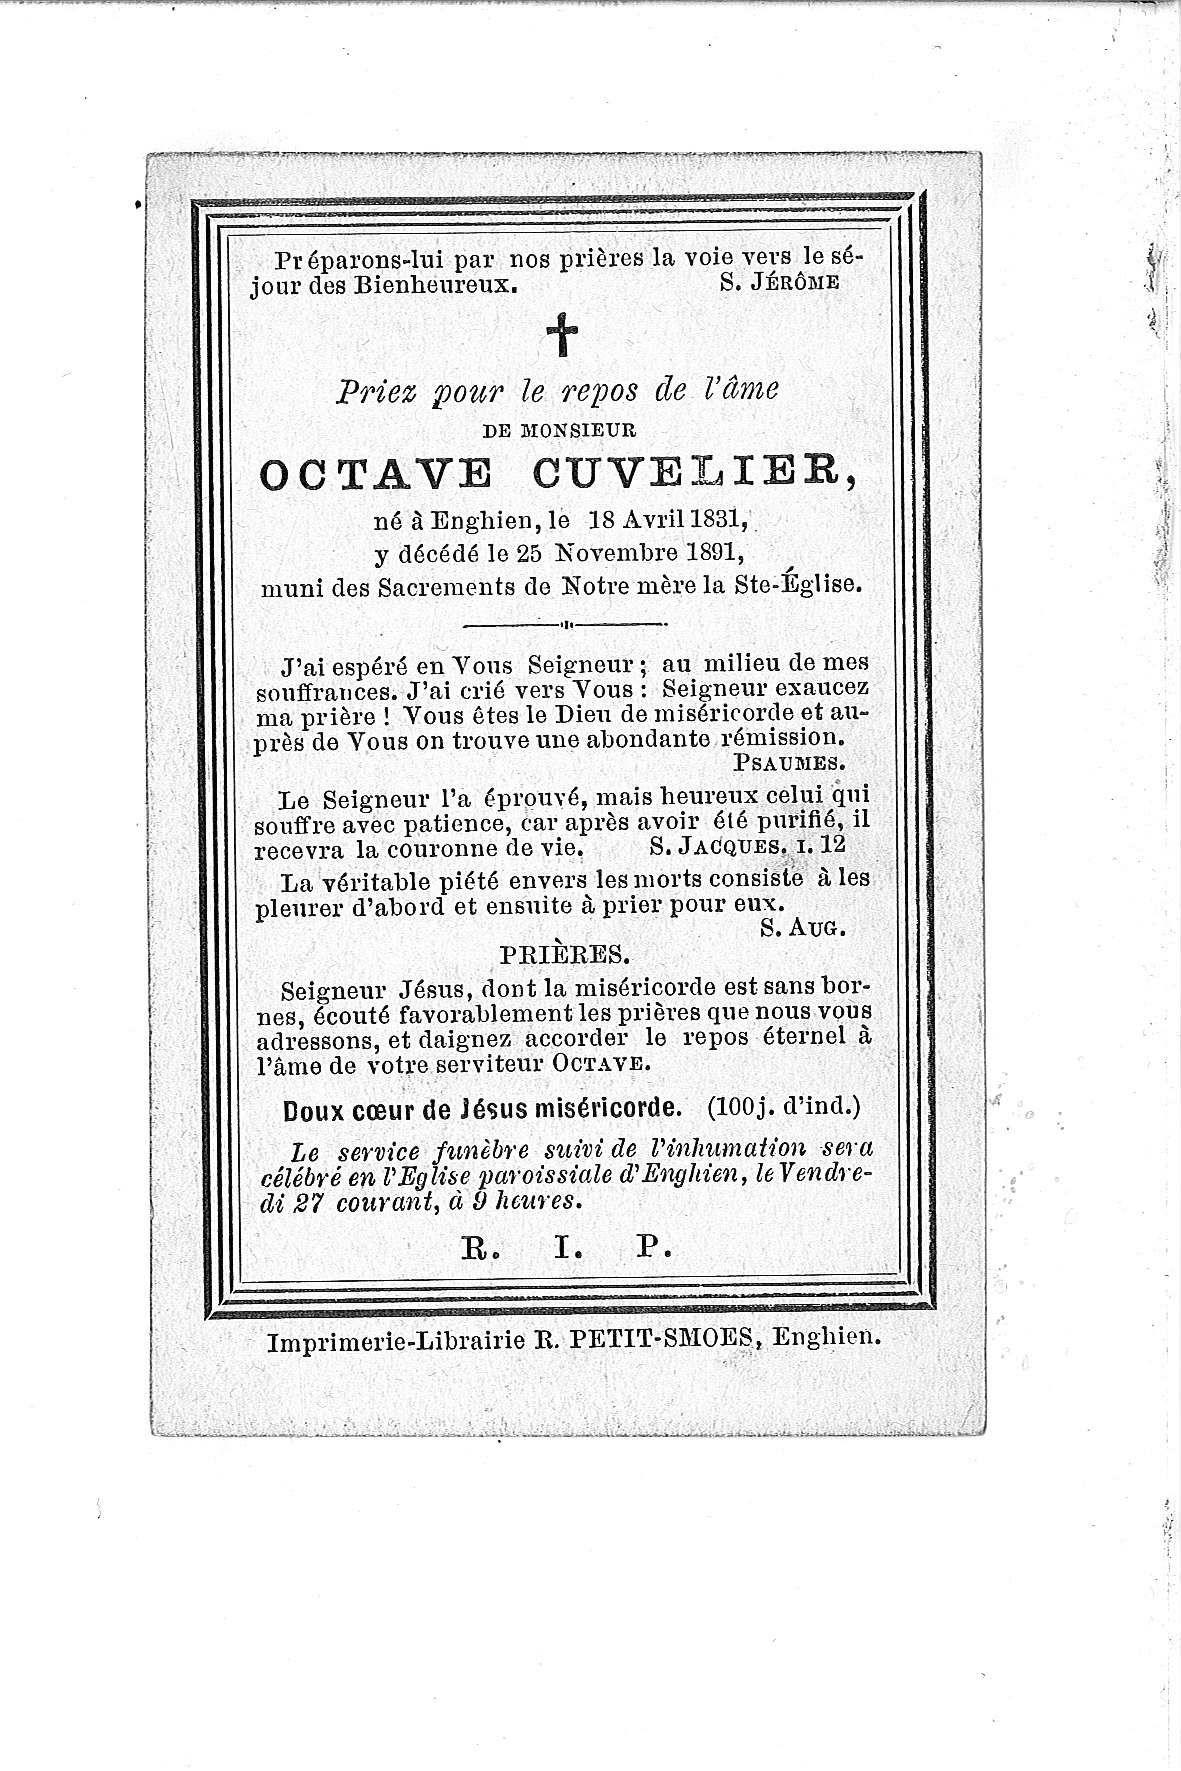 Octave (1891) 20120123114116_00064.jpg